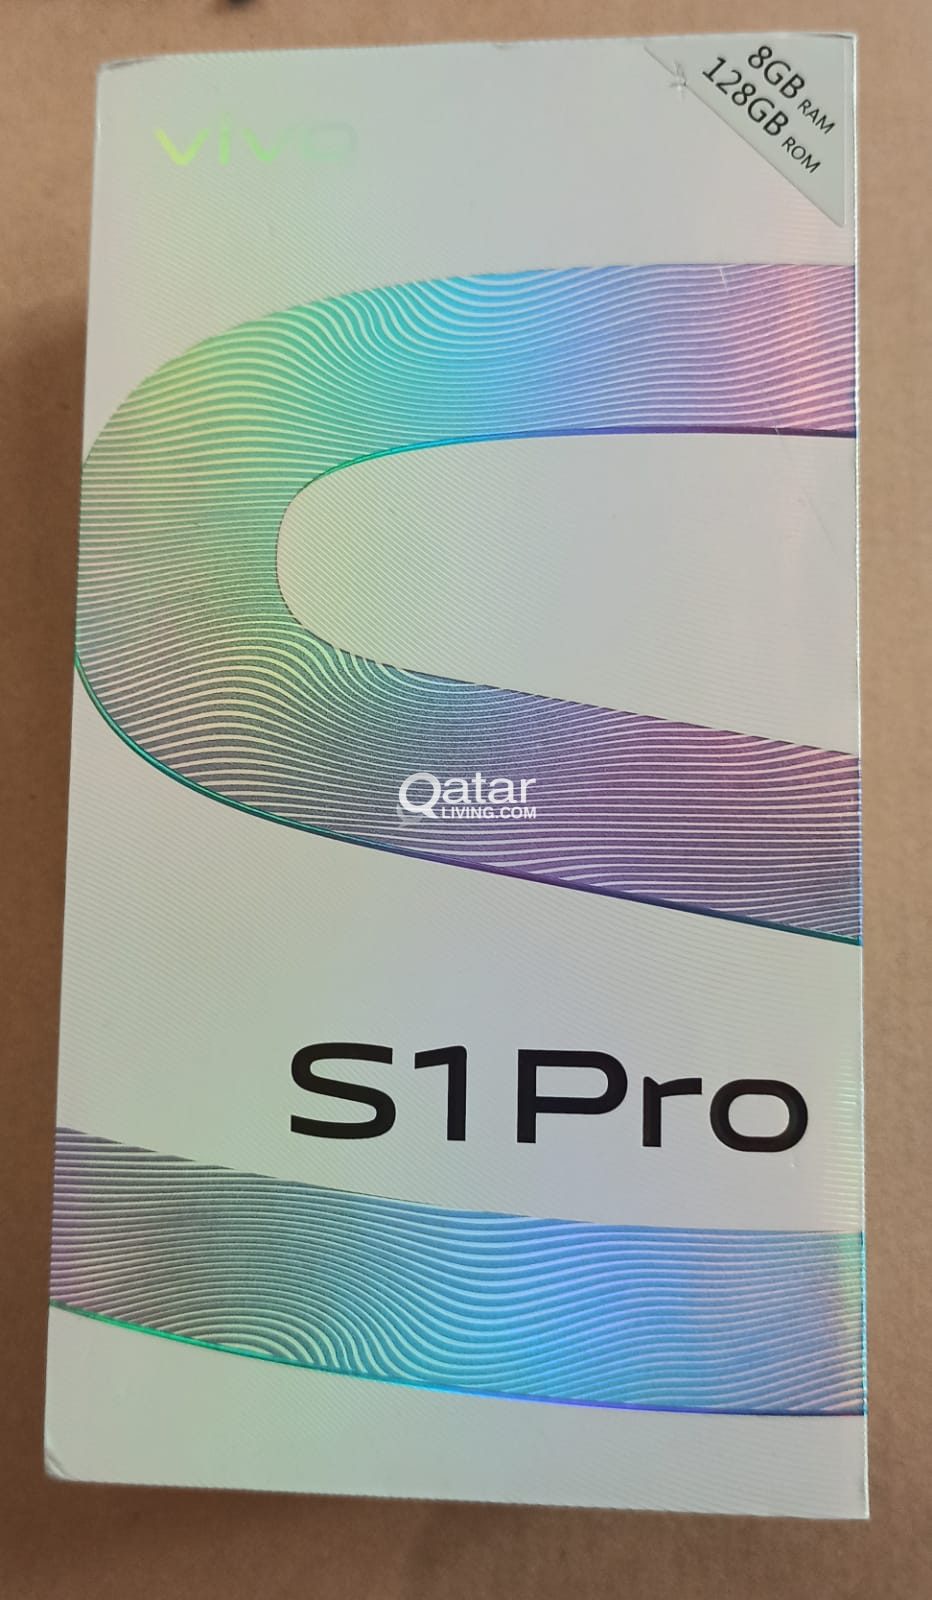 VIVO S1 Pro 8GB 128 GB one month old